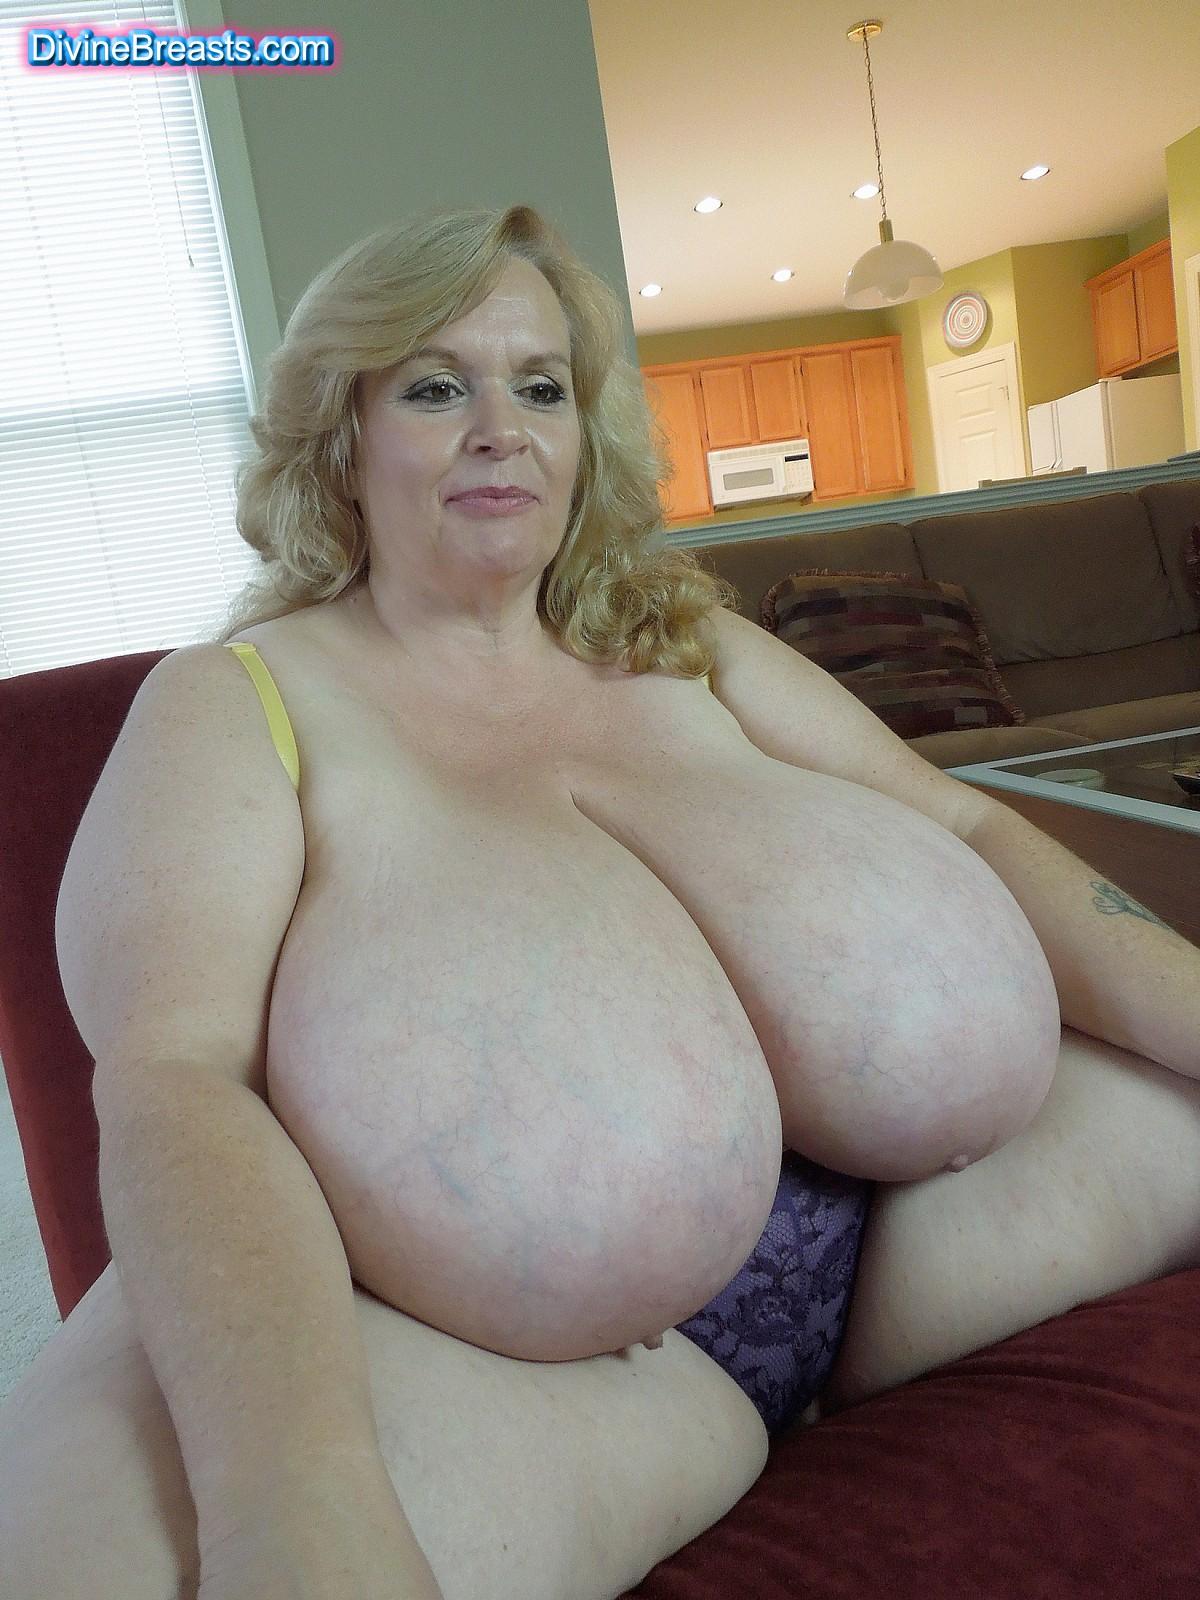 Adult Video Suck fucks chubby dick fucks fucked